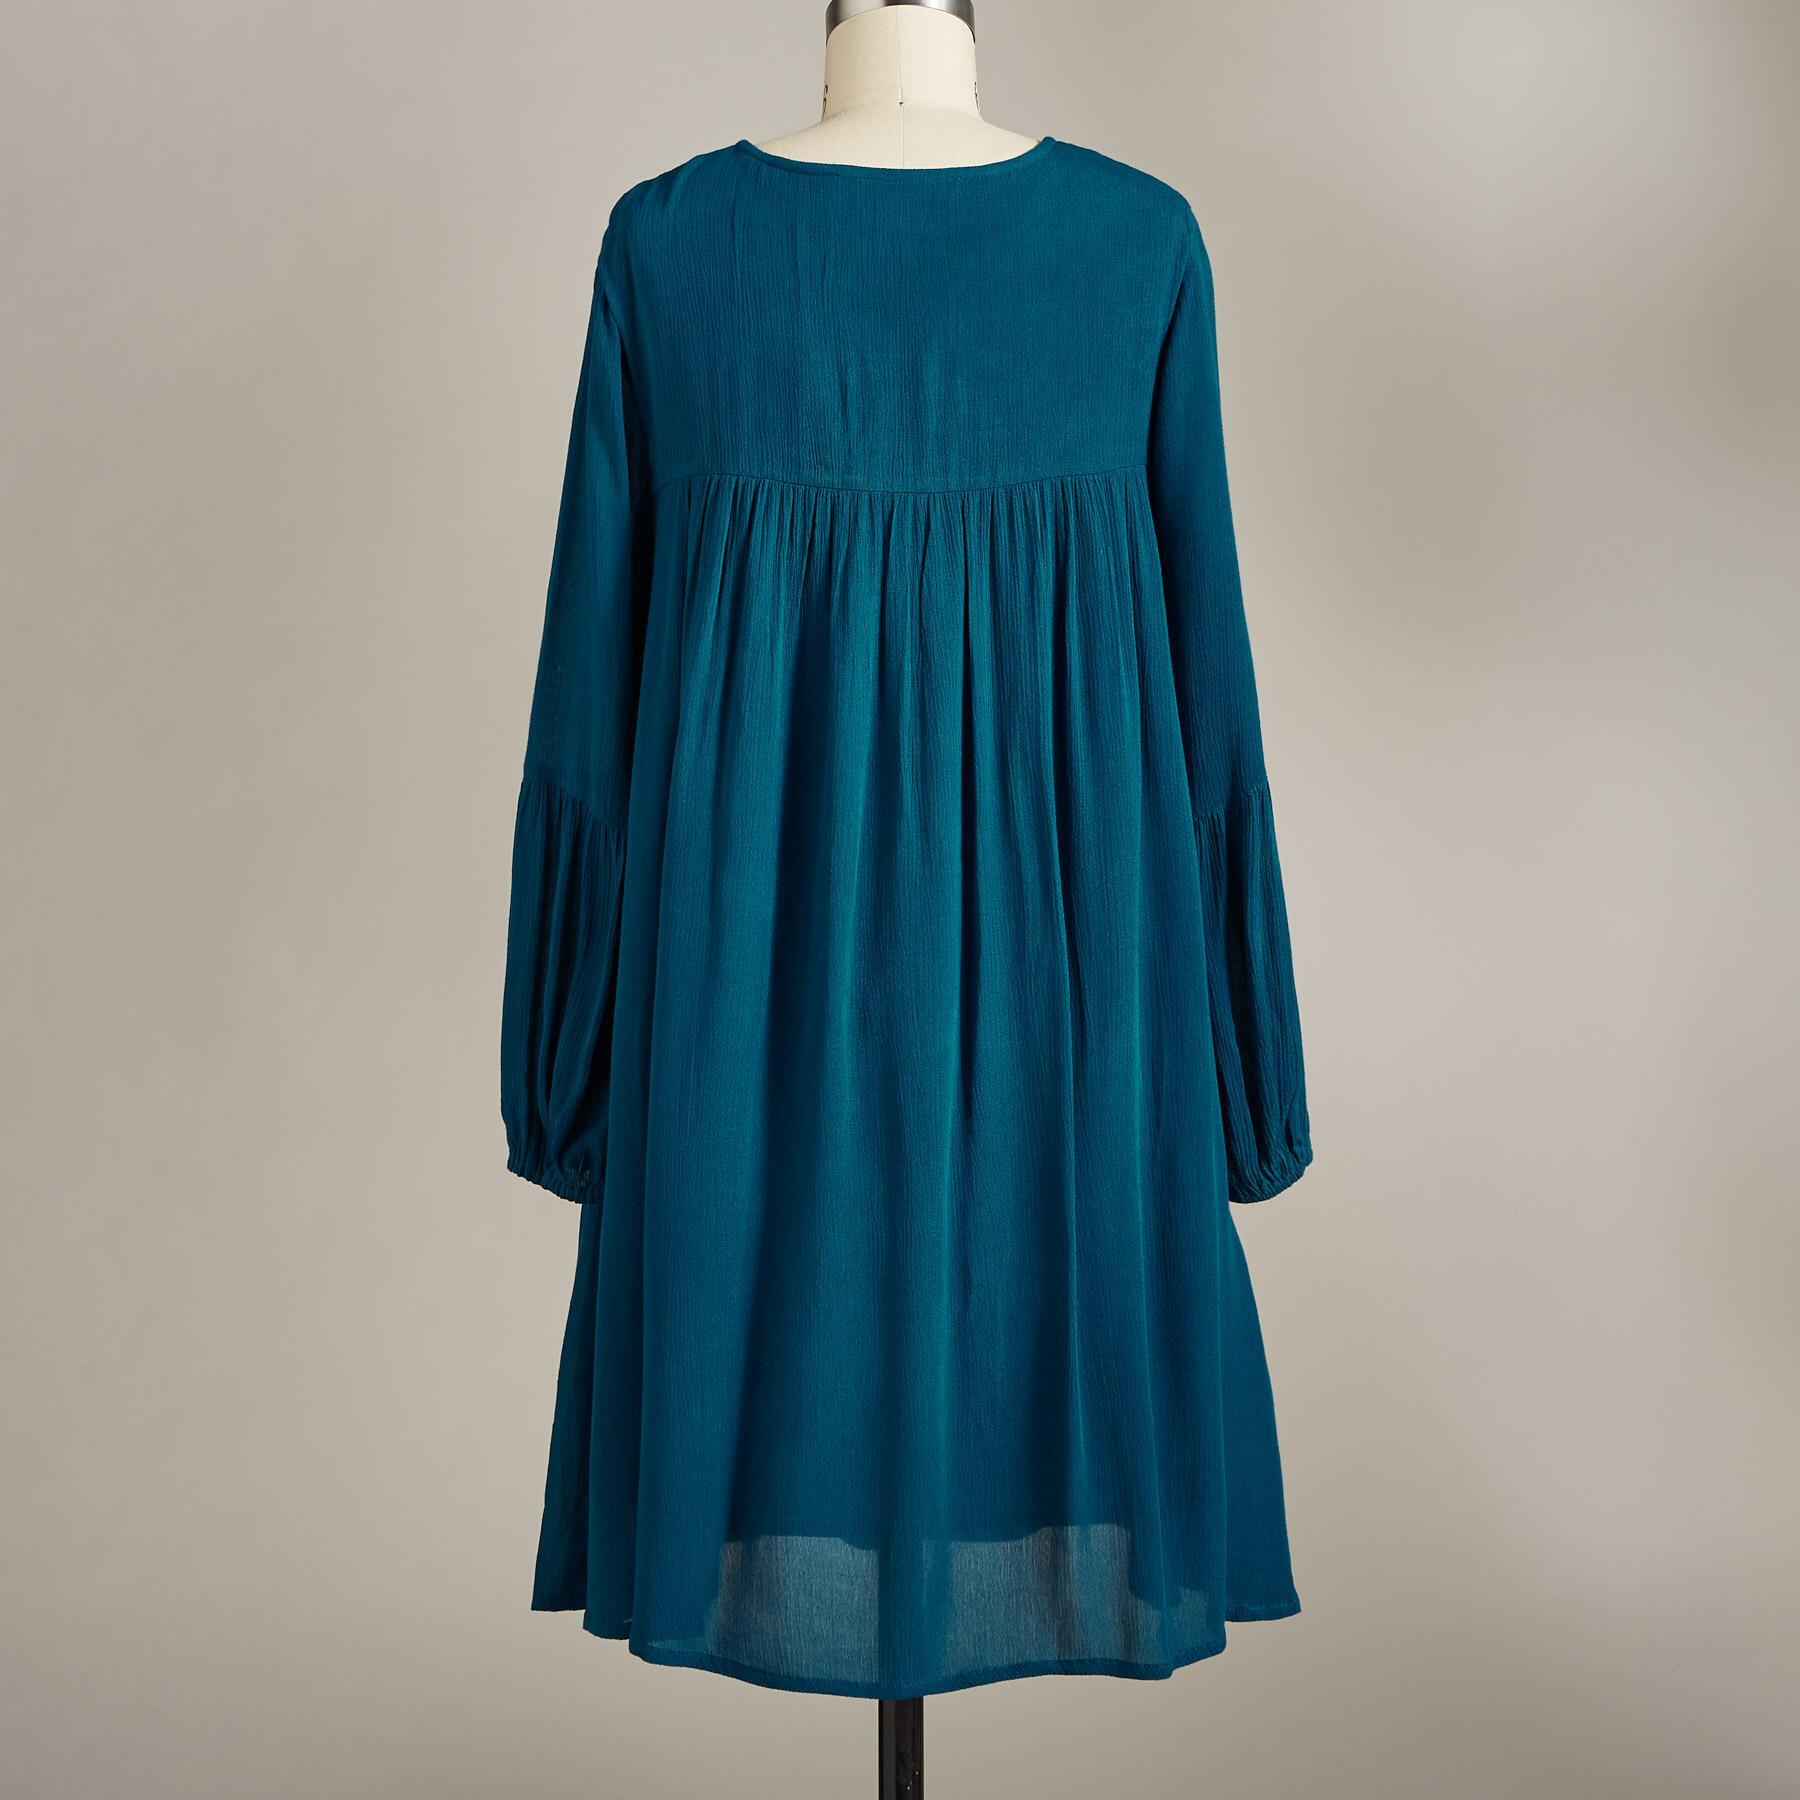 SUELTA DRESS PETITE: View 2